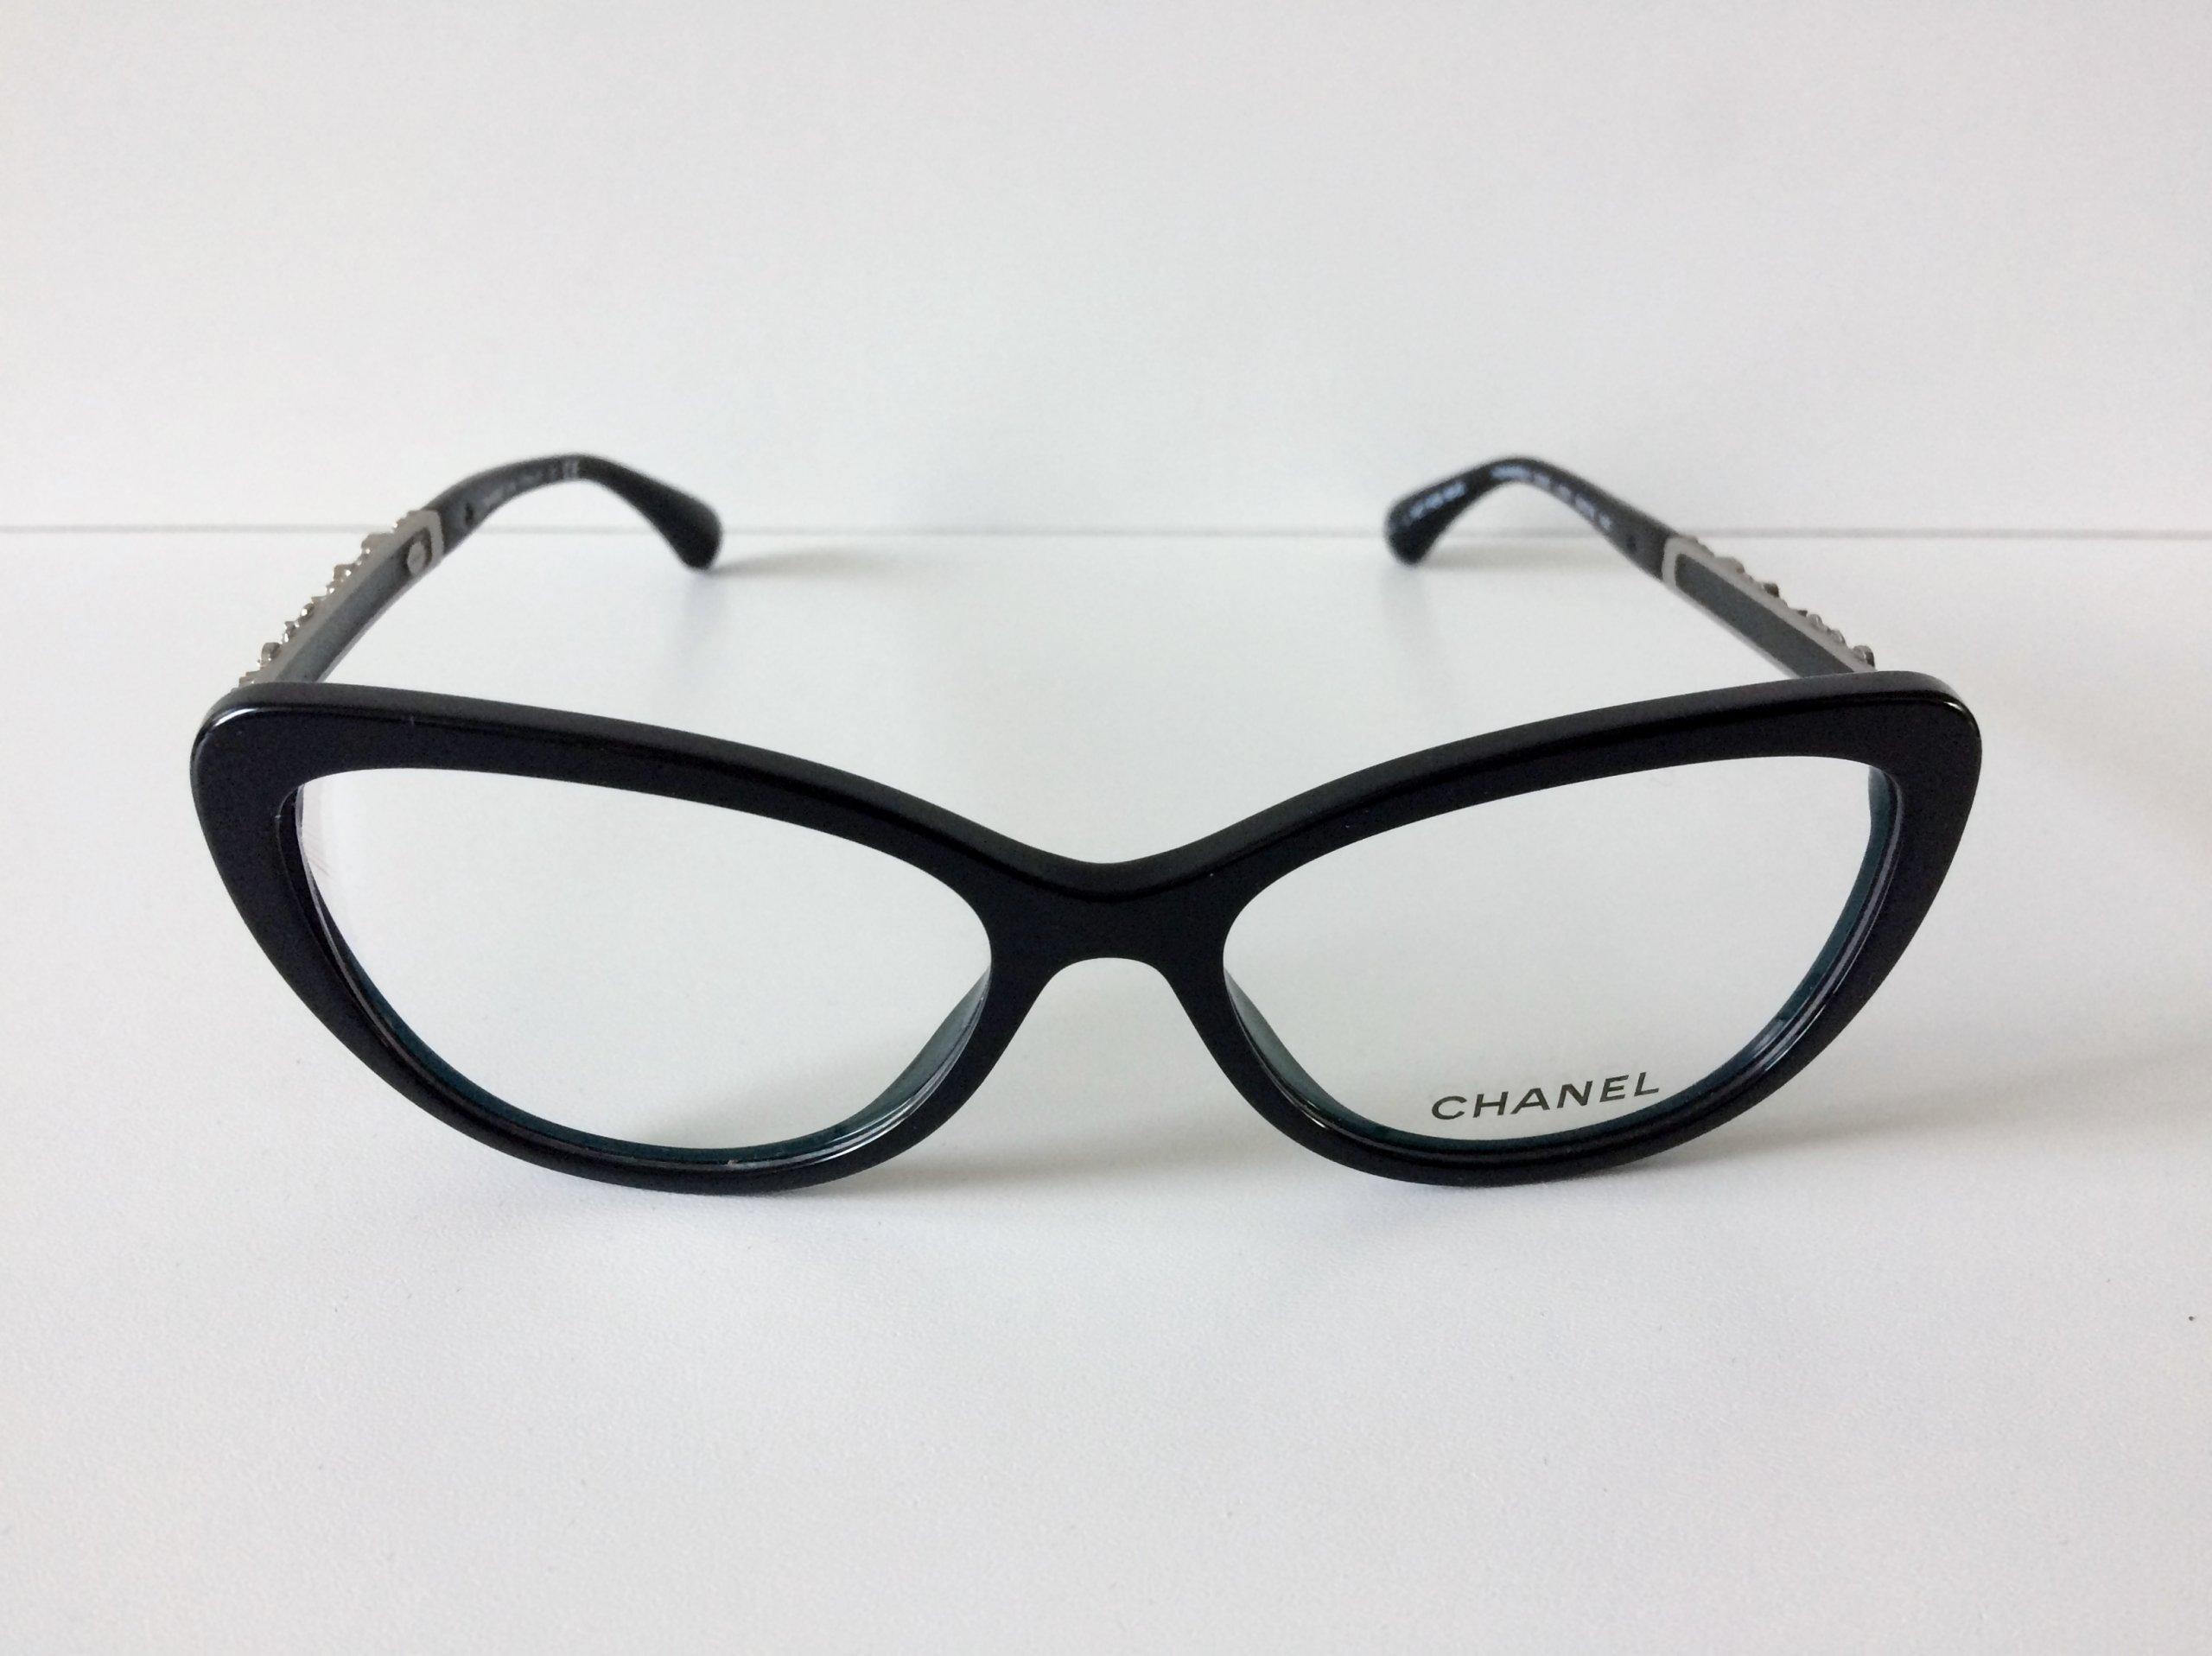 c250dc380c199a Chanel 3345 c.501 Okulary Korekcyjne Super!!! - 7393488705 ...